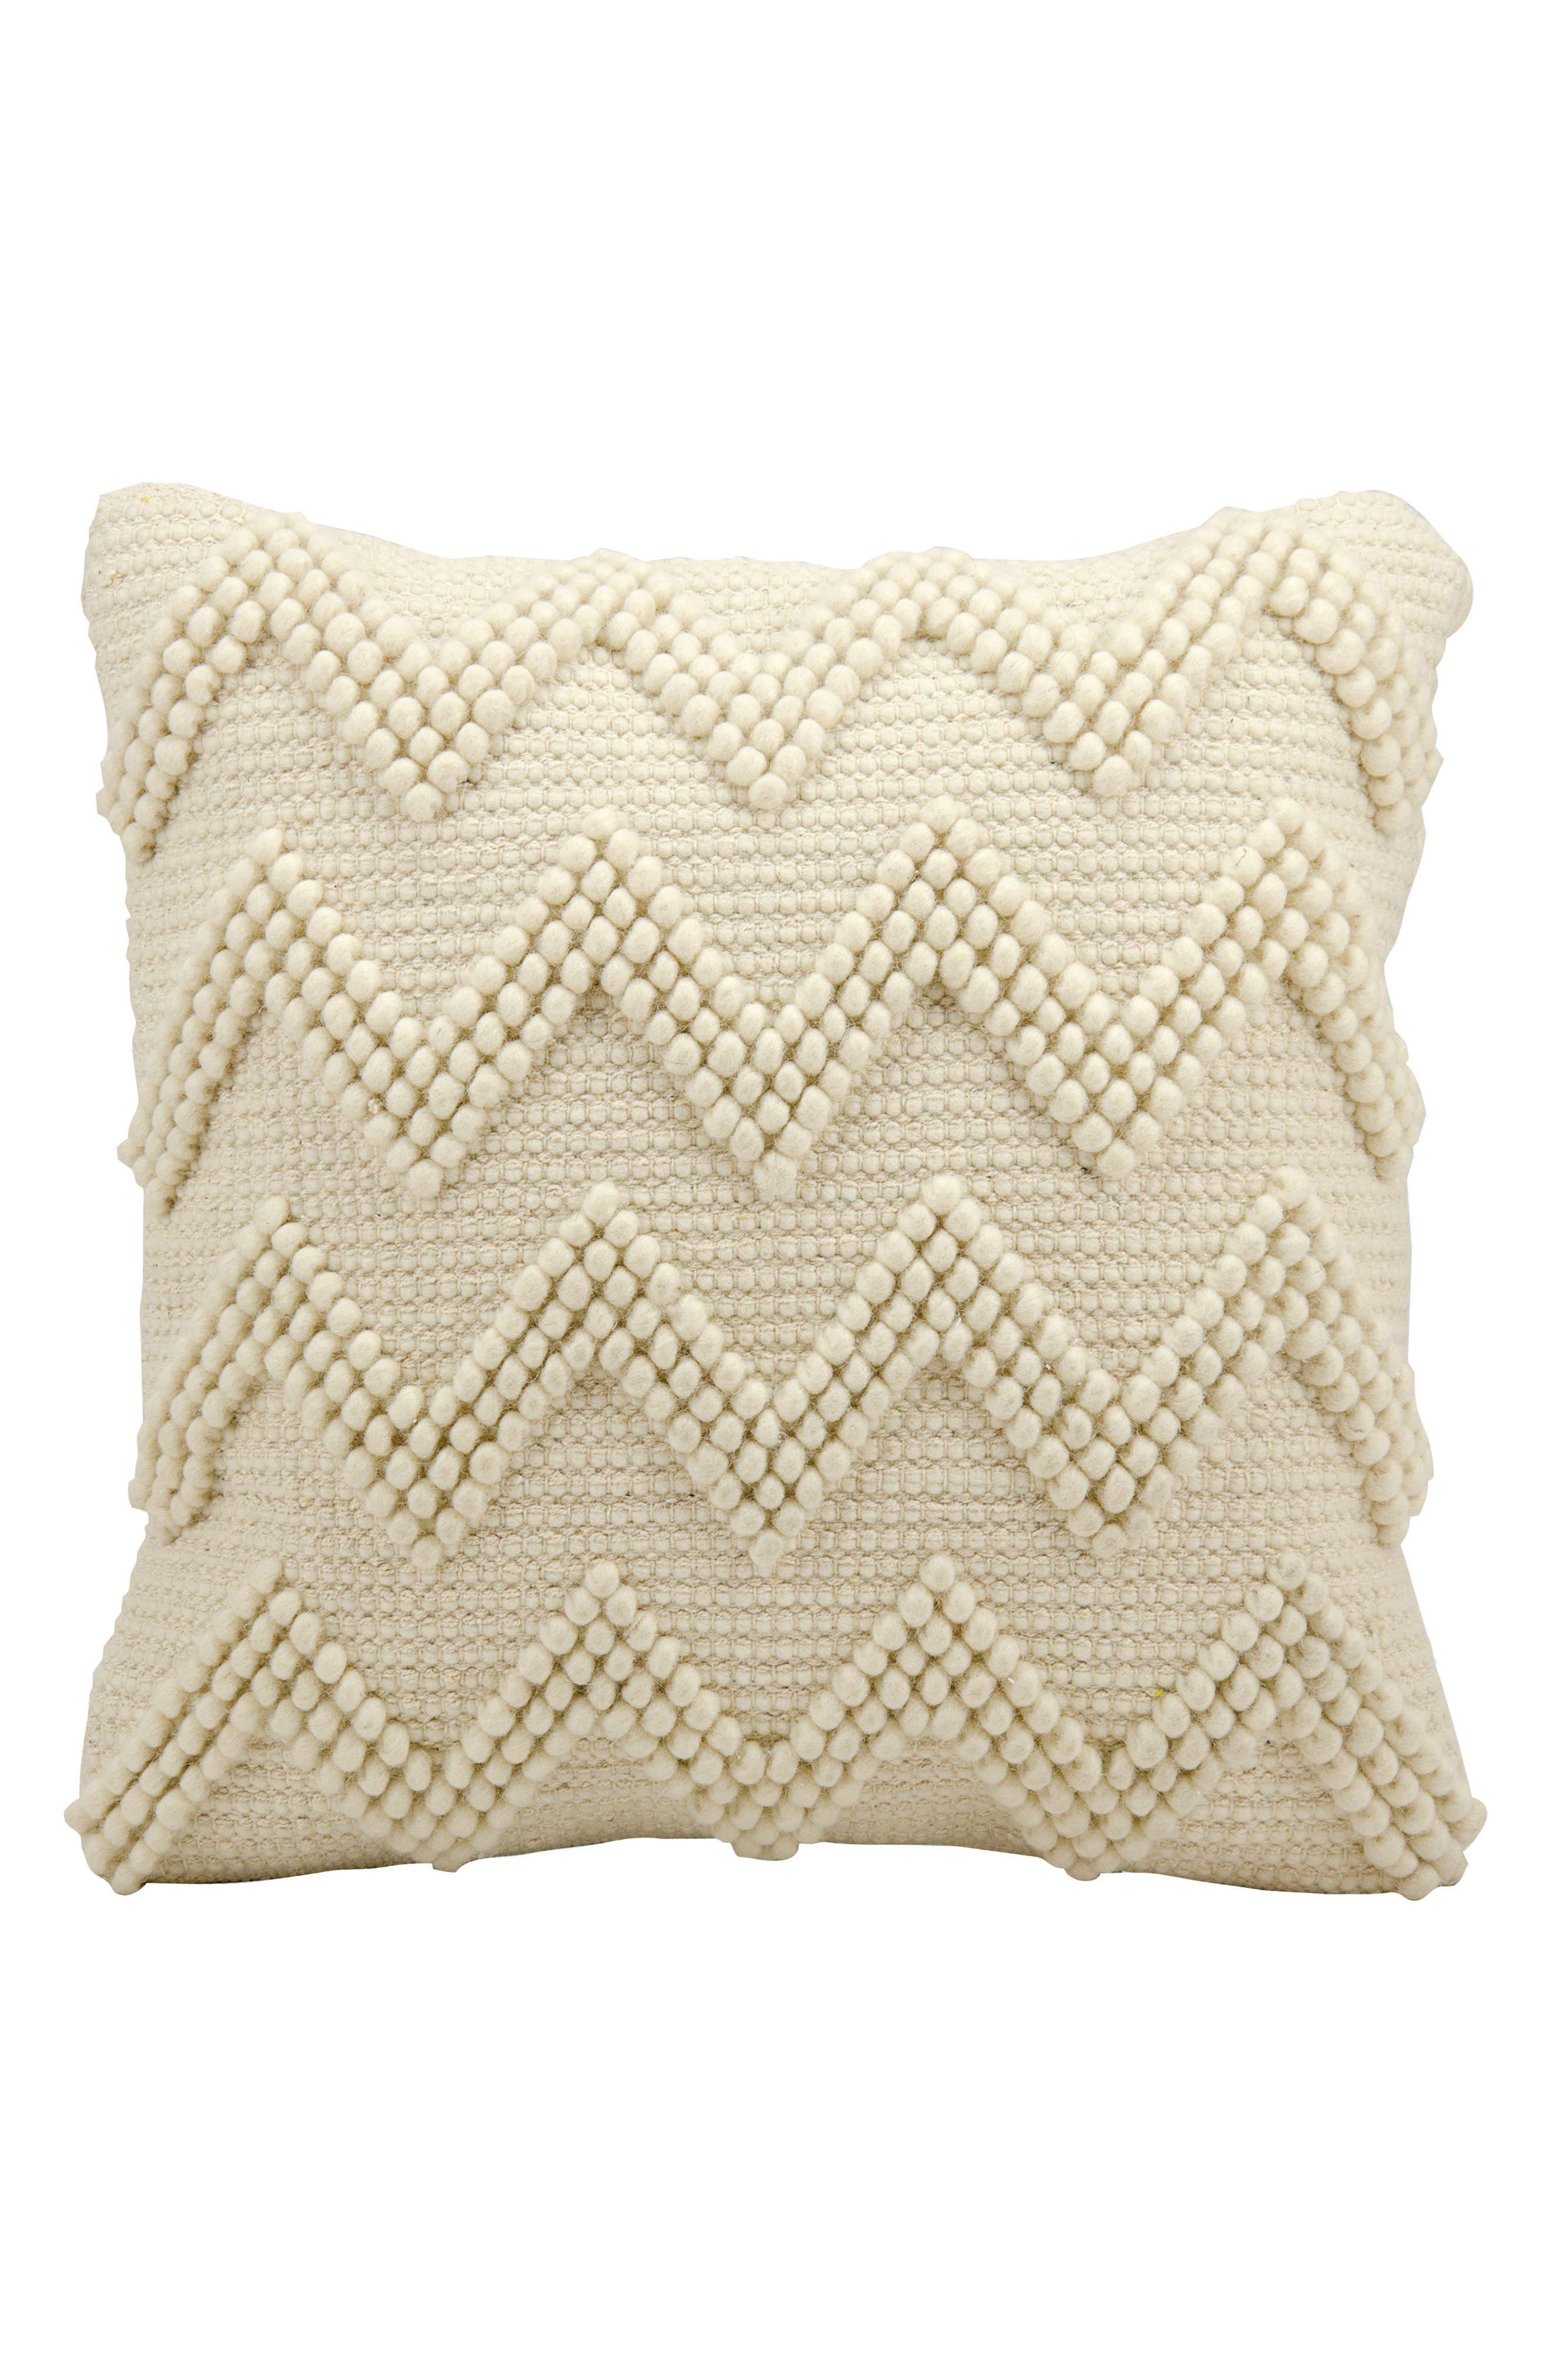 Chevron Pom Accent Pillow,                         Main,                         color, IVORY